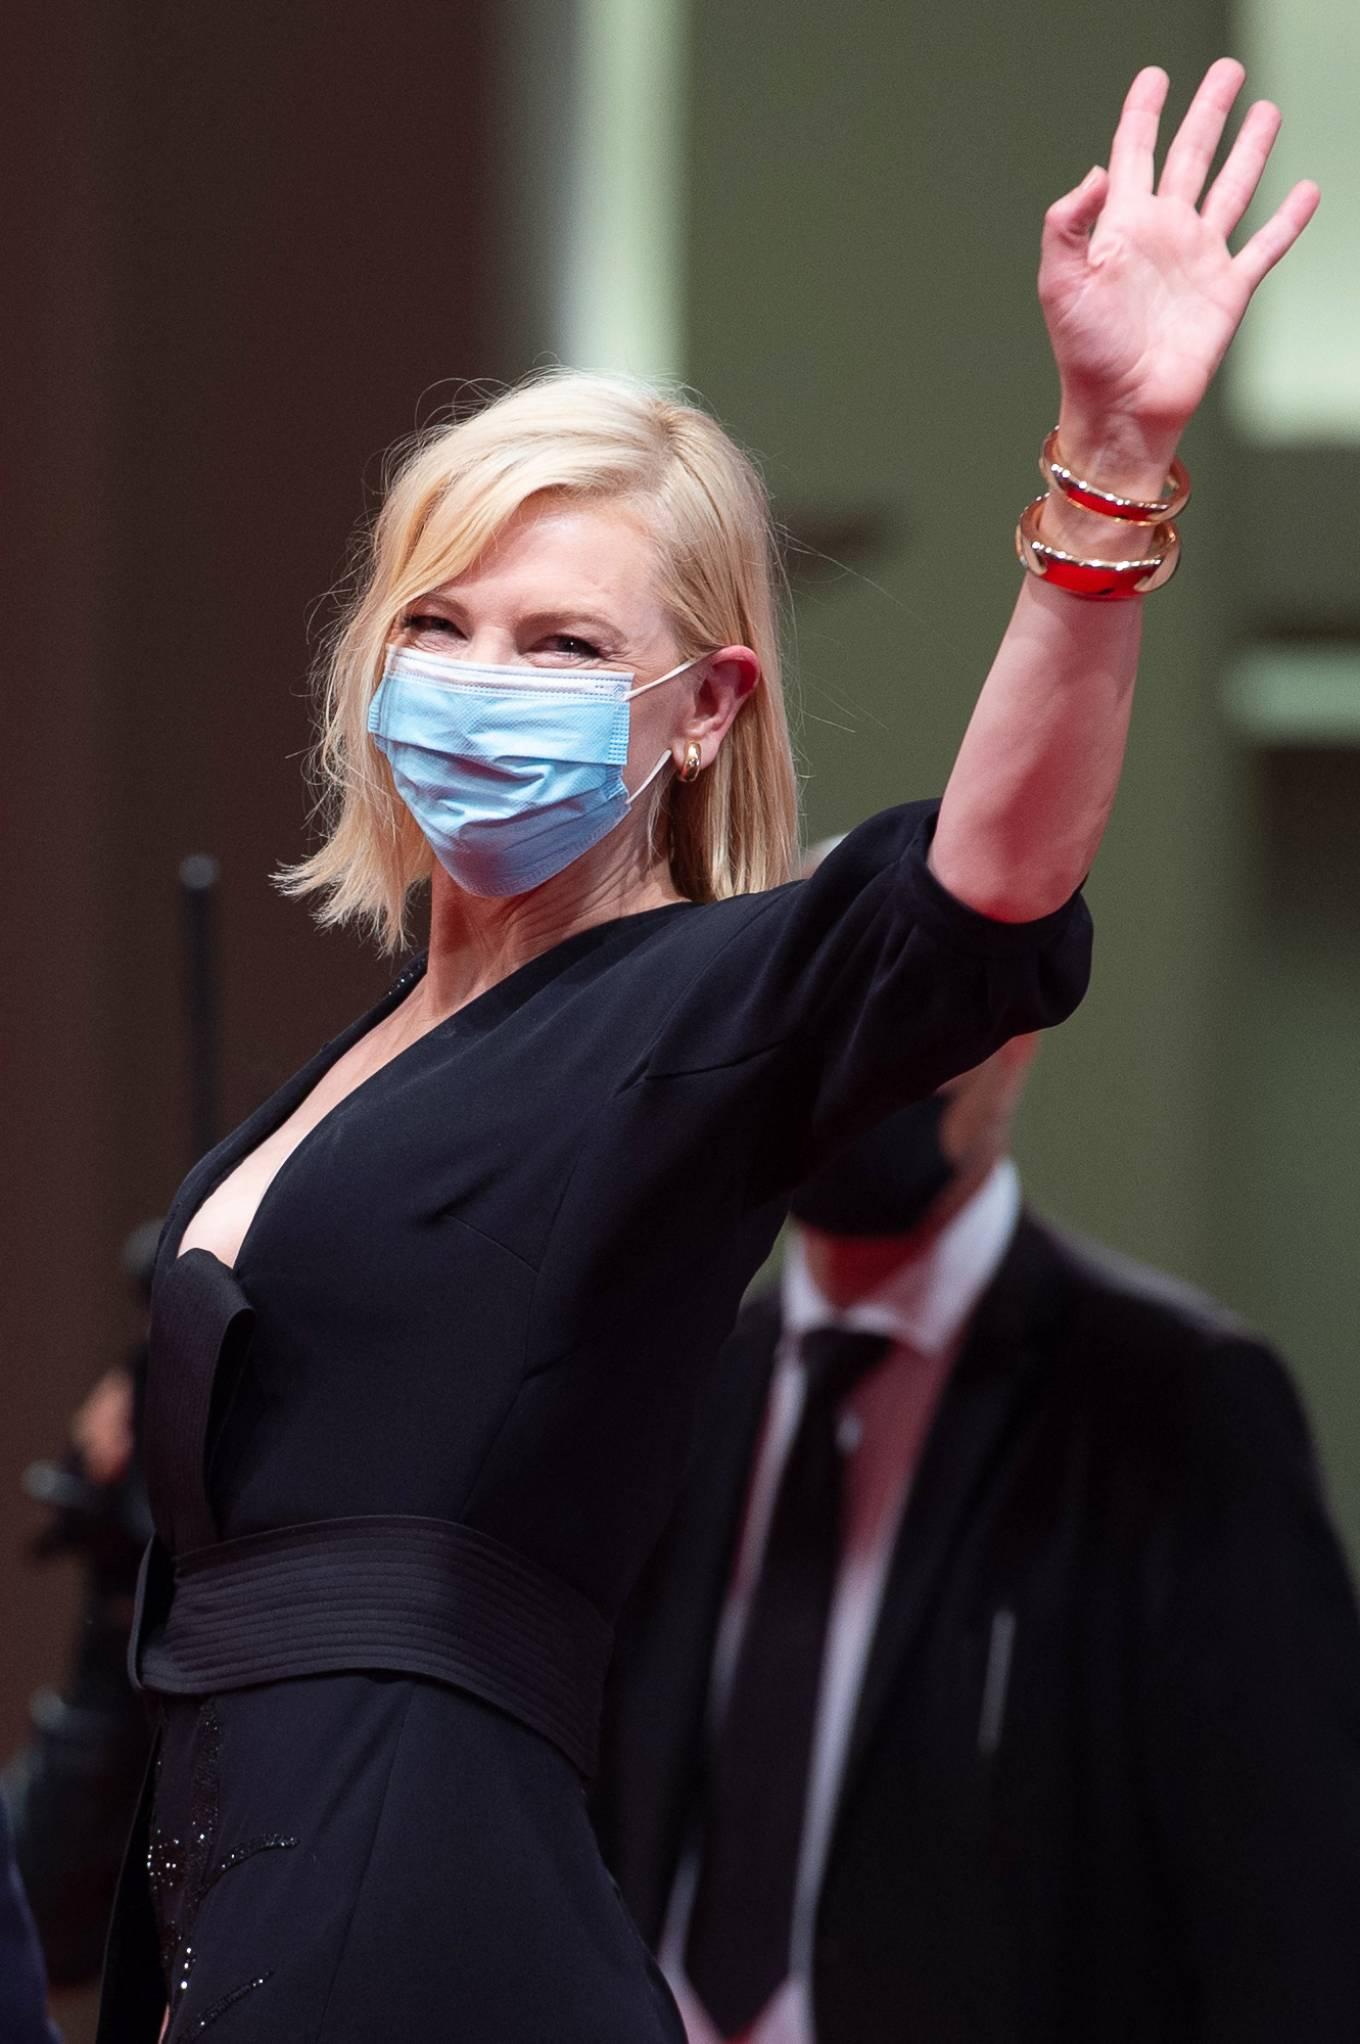 Cate Blanchett 2020 : Cate Blanchett – Spy No Tsuma (Wife of a Spy) Premiere – 2020 Venice Film Festival-02